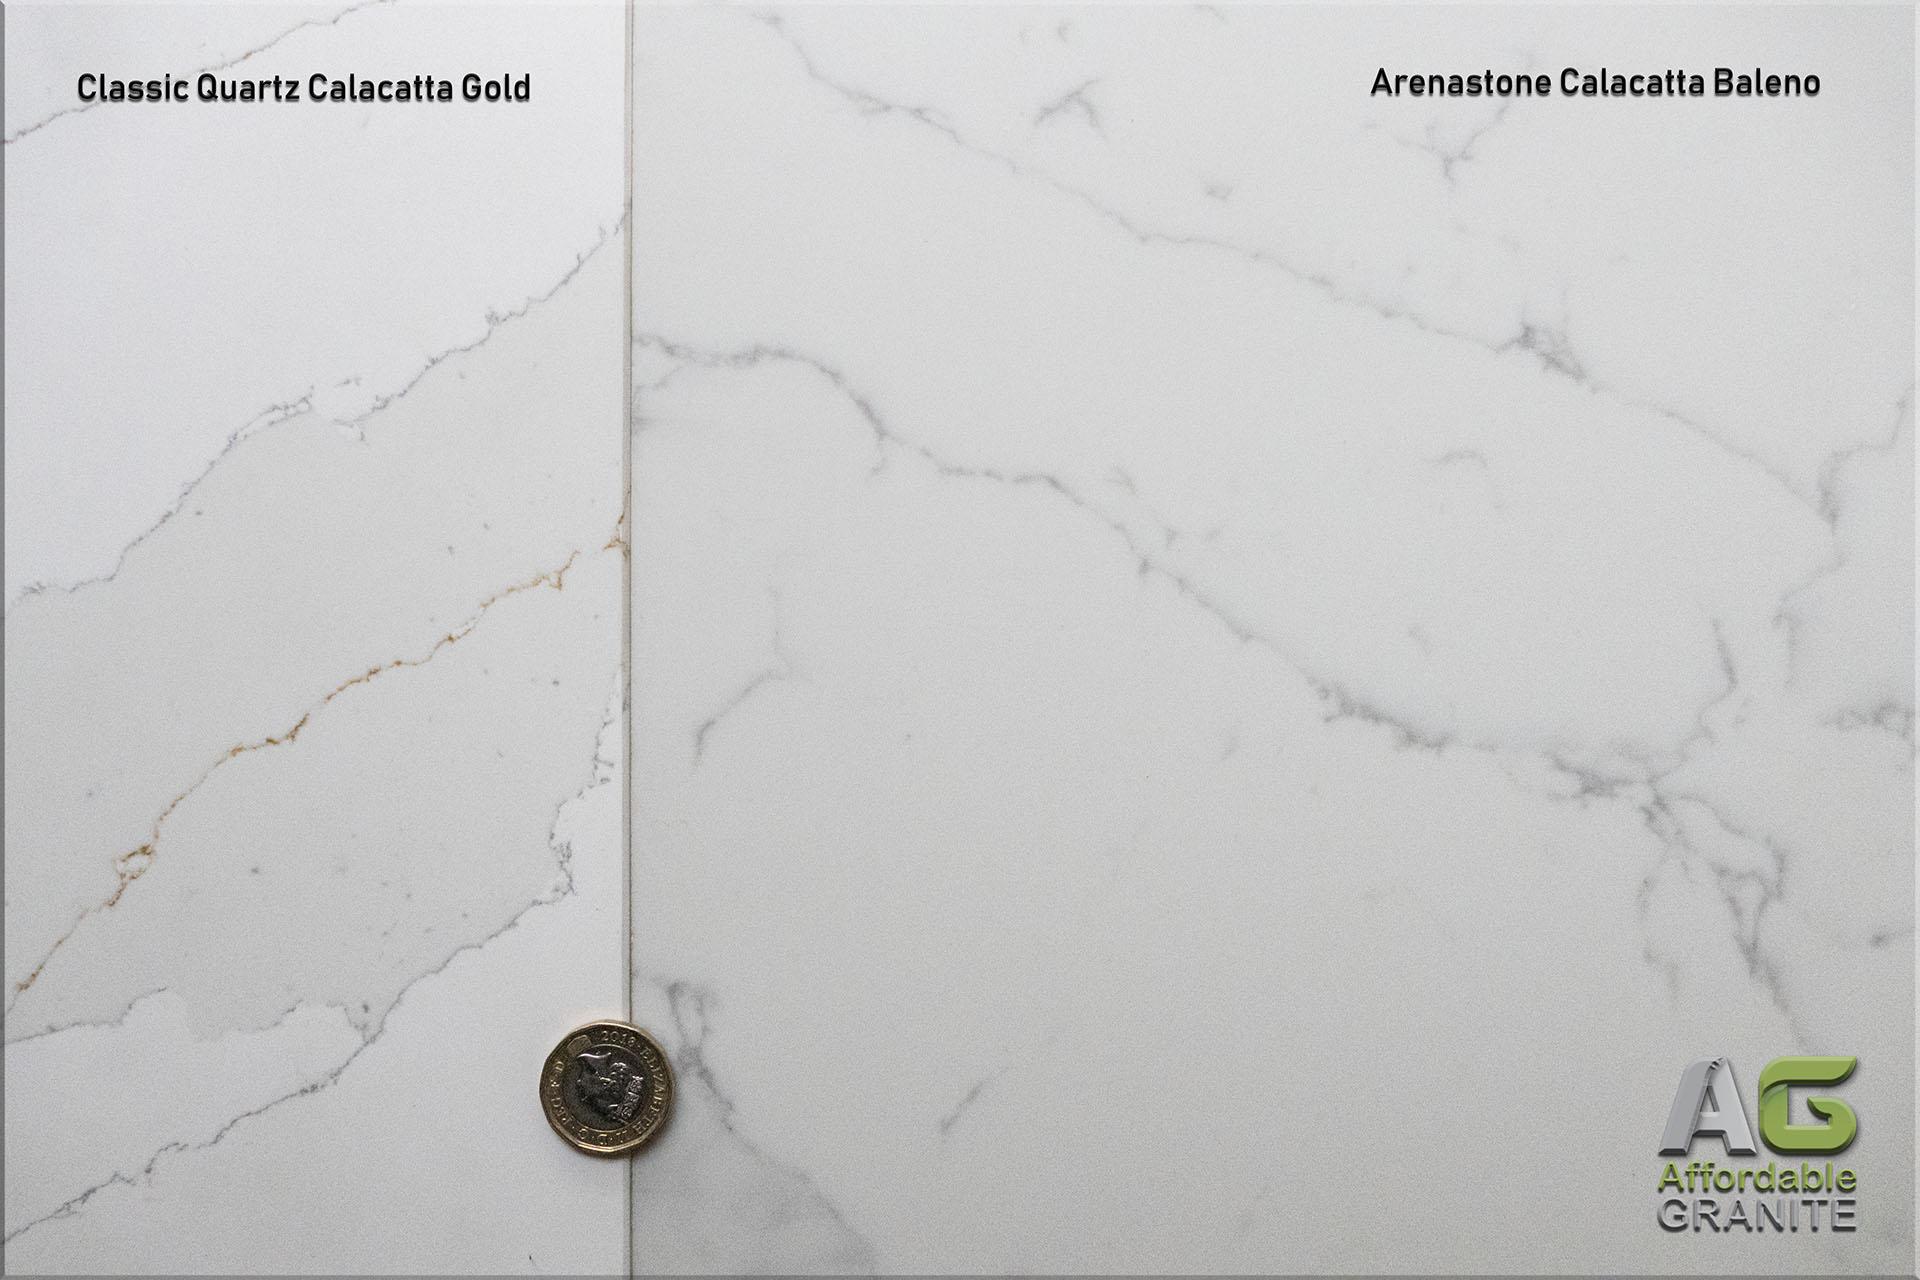 Arenastone Calacatta Baleno Classic Quartz Calacatta Gold red